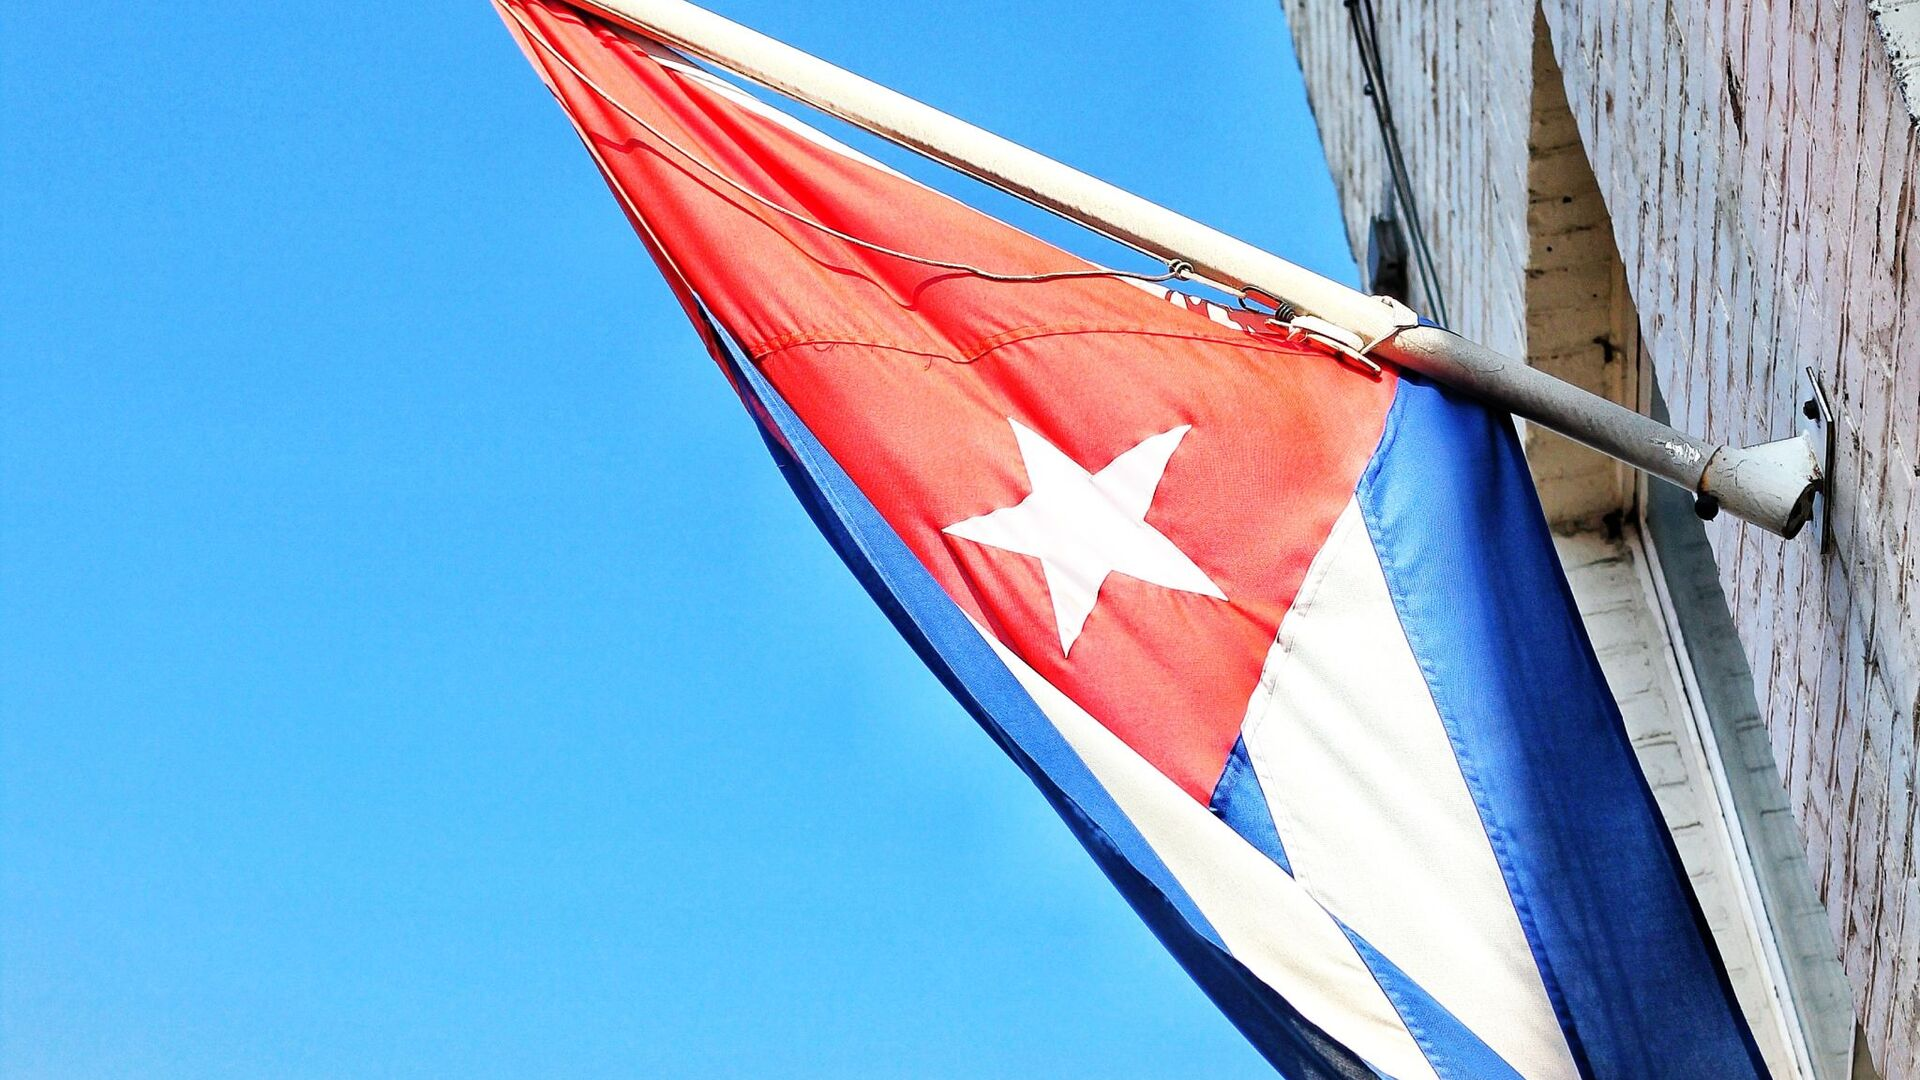 La bandera de Cuba - Sputnik Mundo, 1920, 15.04.2021